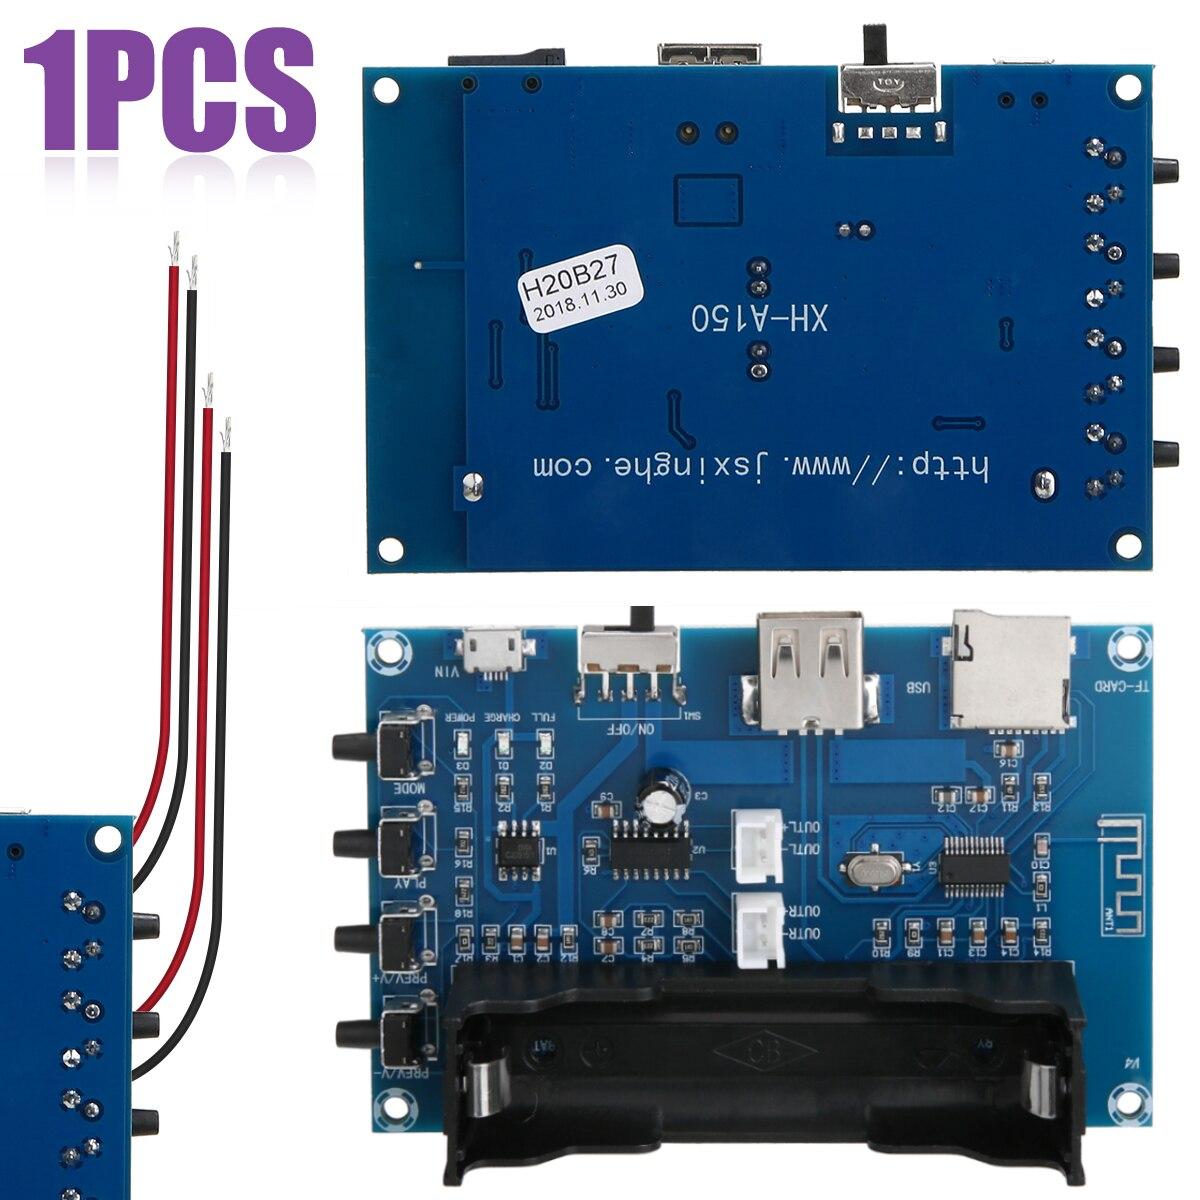 New Digital bluetooth 4.0 Power Amplifier Board 2 Channel PAM8403 Stereo AMP USB 18650 Battery Power For Speaker